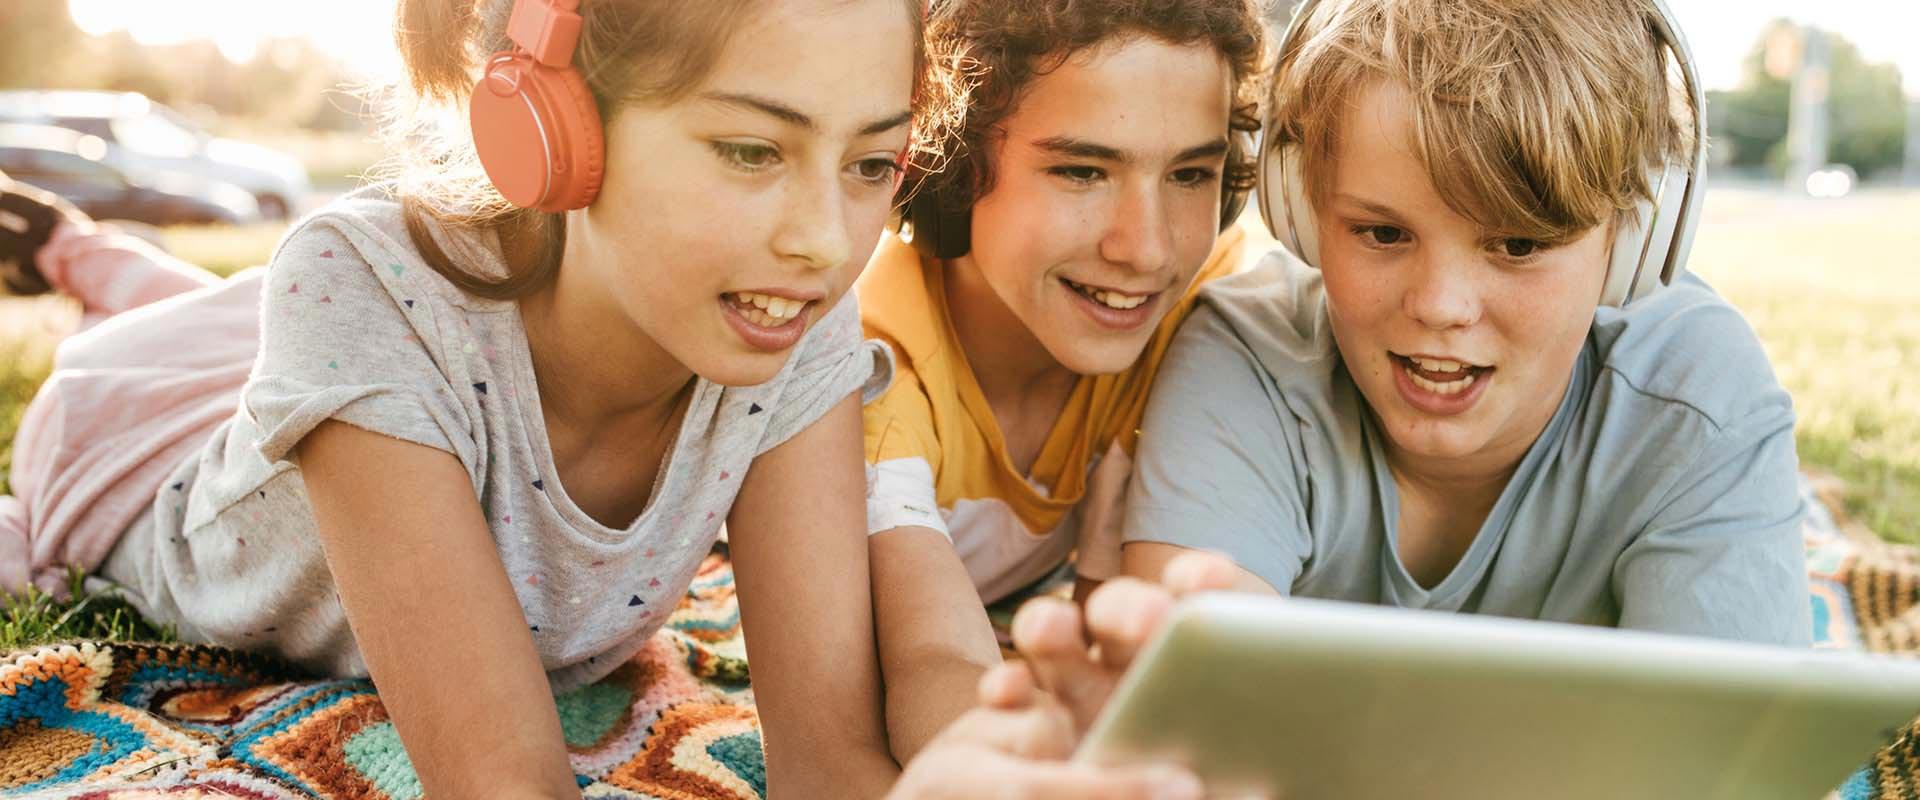 District School Board Ontario North East Calendar 2019 And In East Carolina Student Breaks 2021